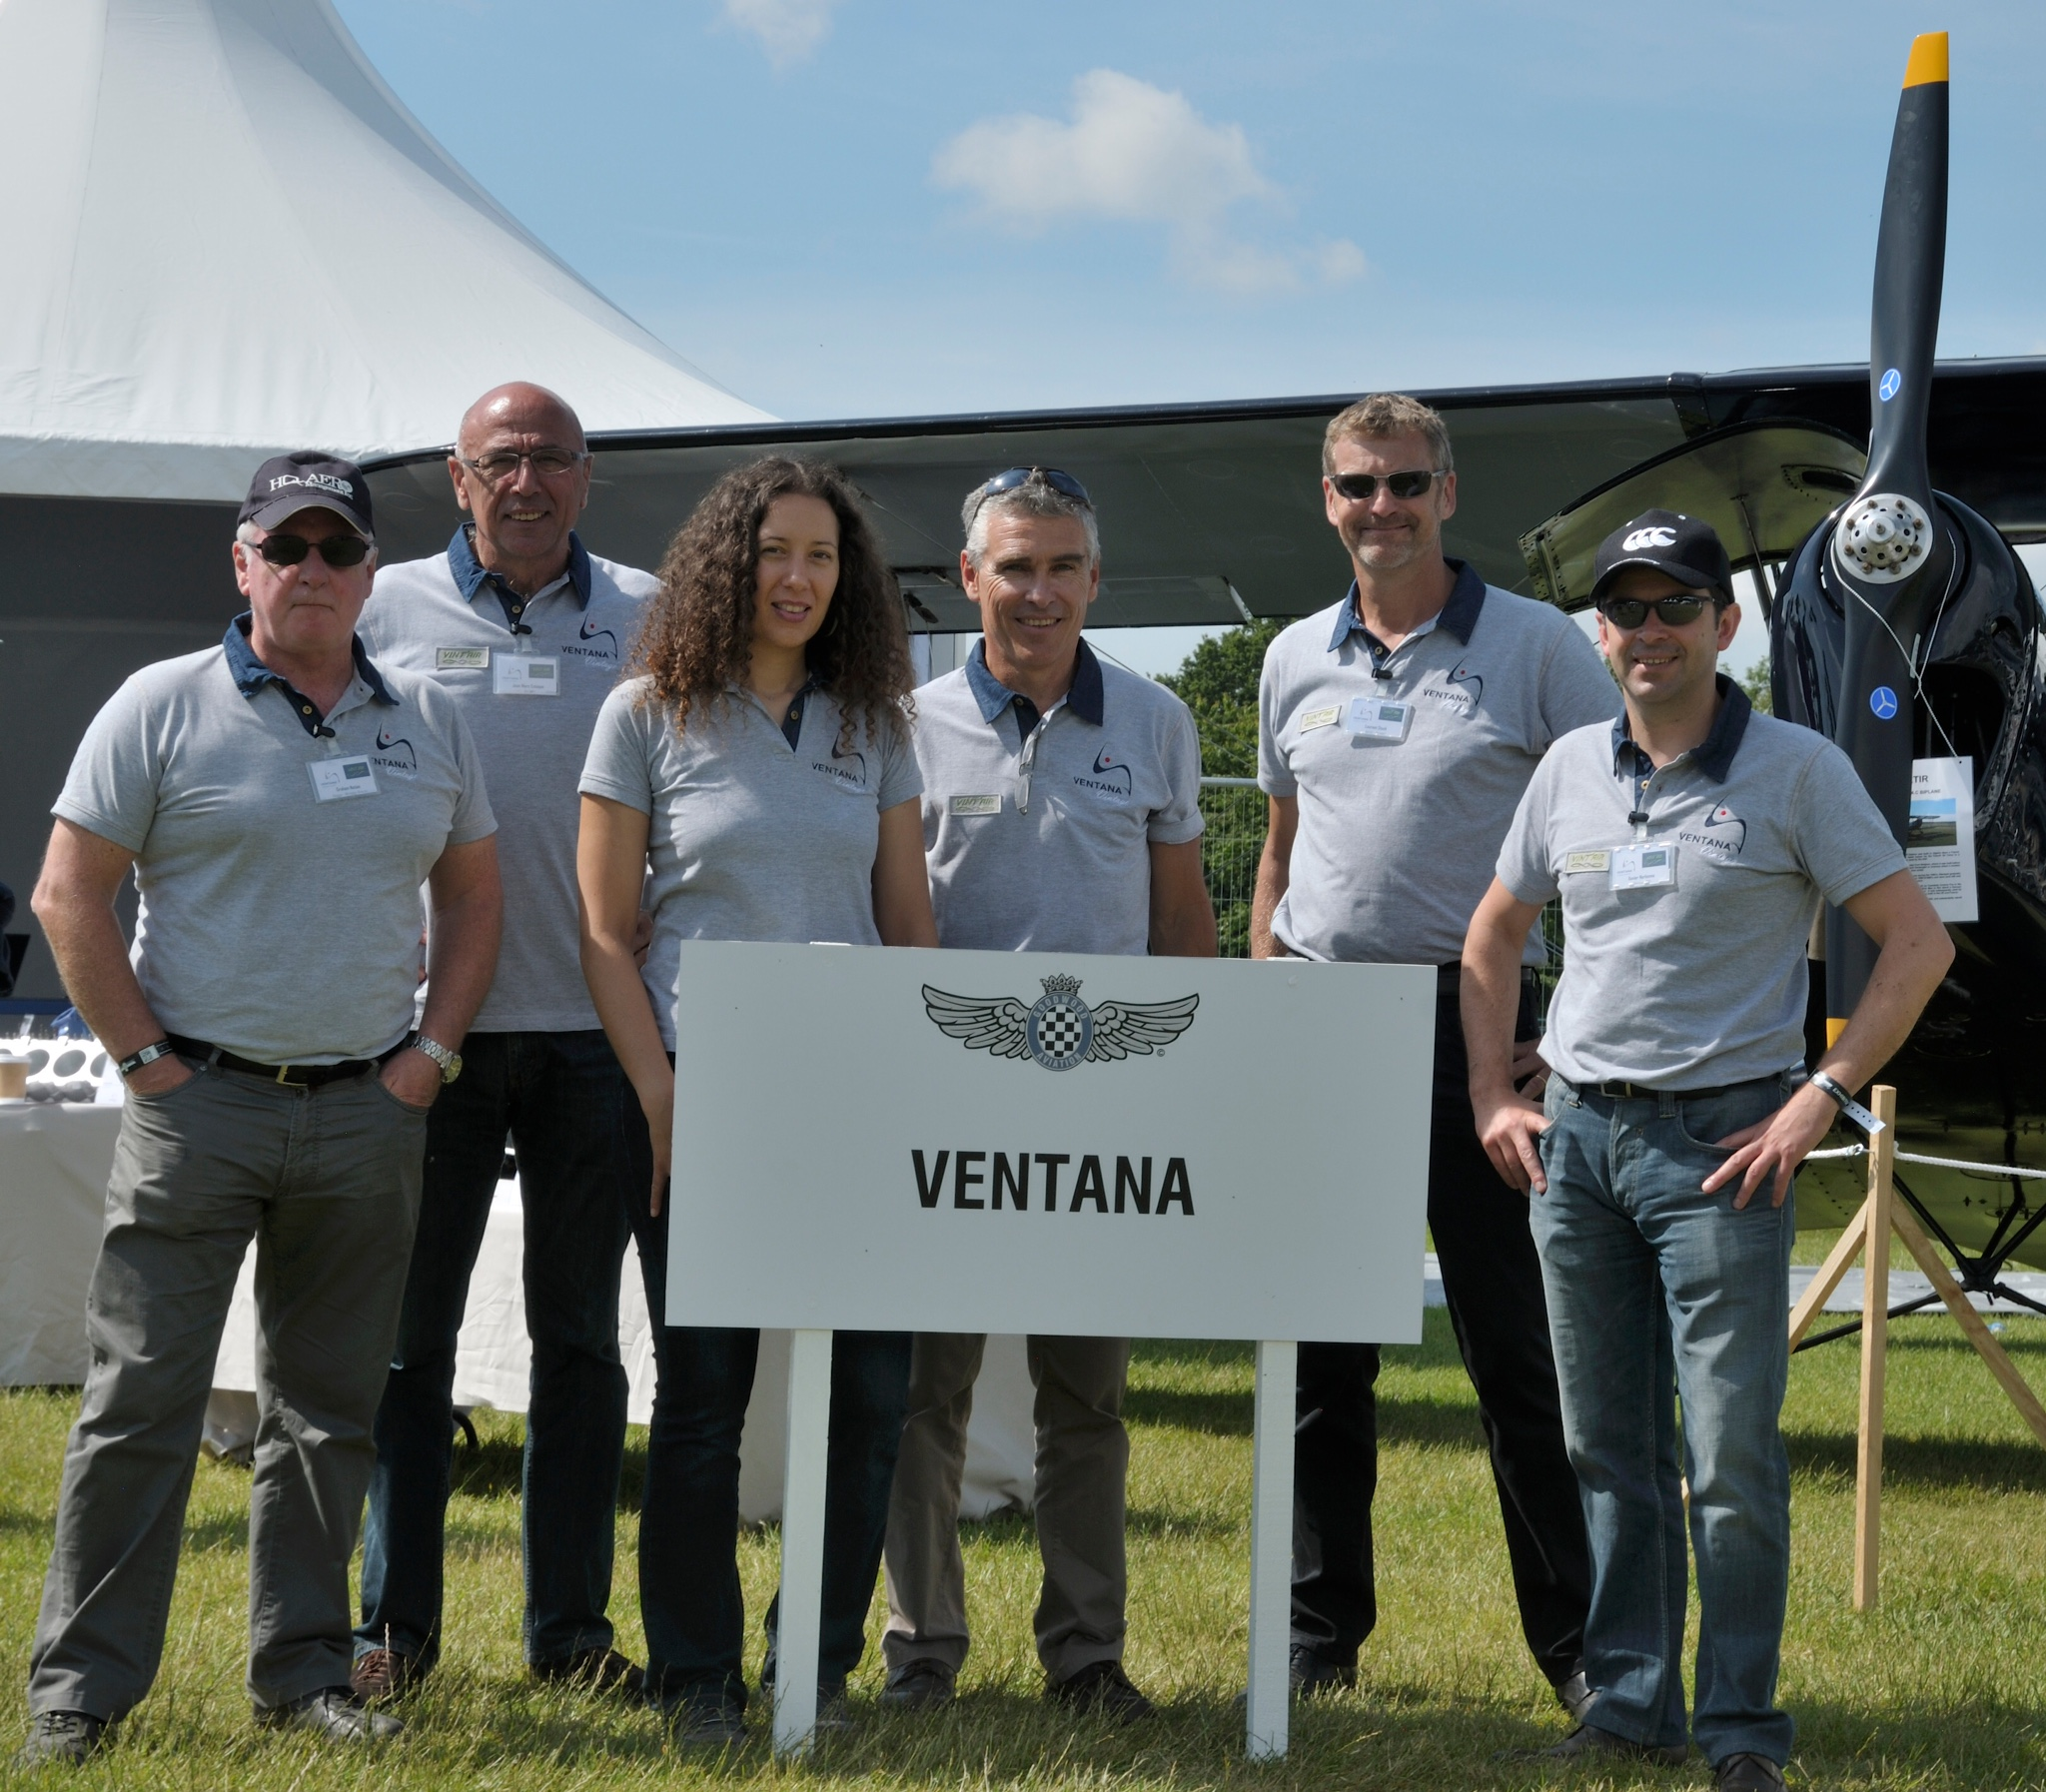 L'équipe Ventana et Vintair